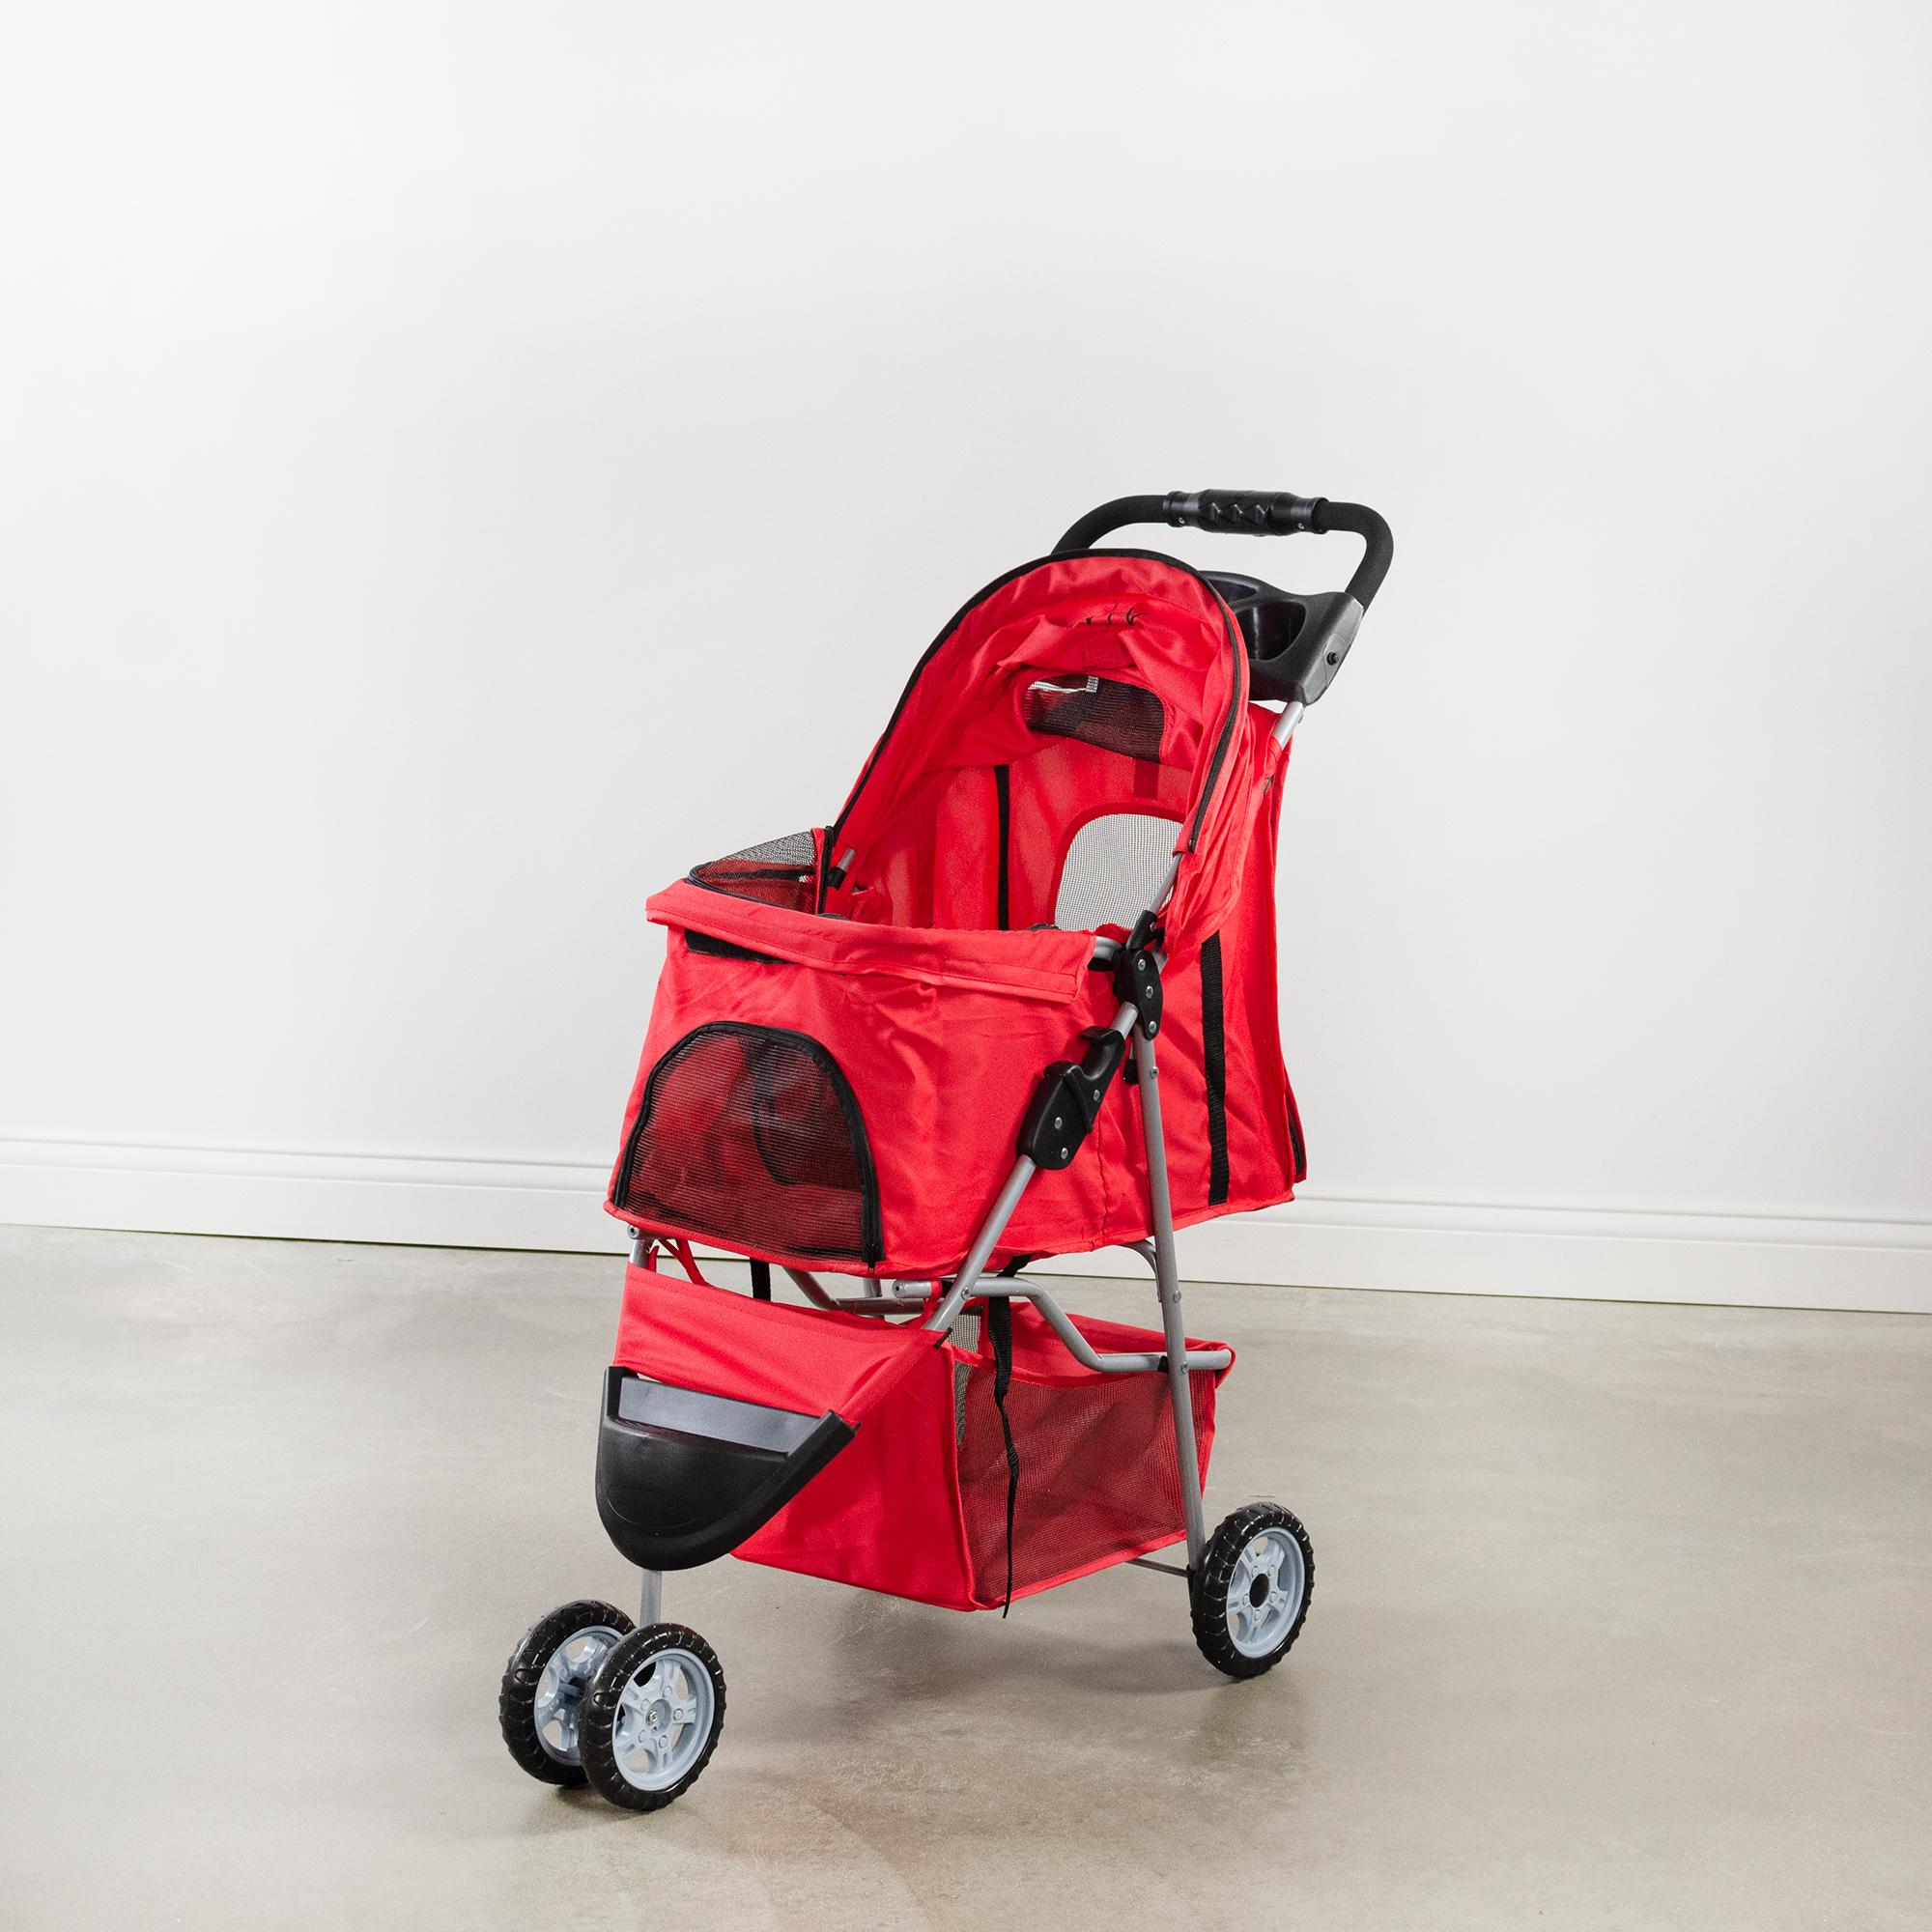 thumbnail 31 - VIVO Three Wheel Pet Stroller / Cat & Dog Foldable Carrier Strolling Cart